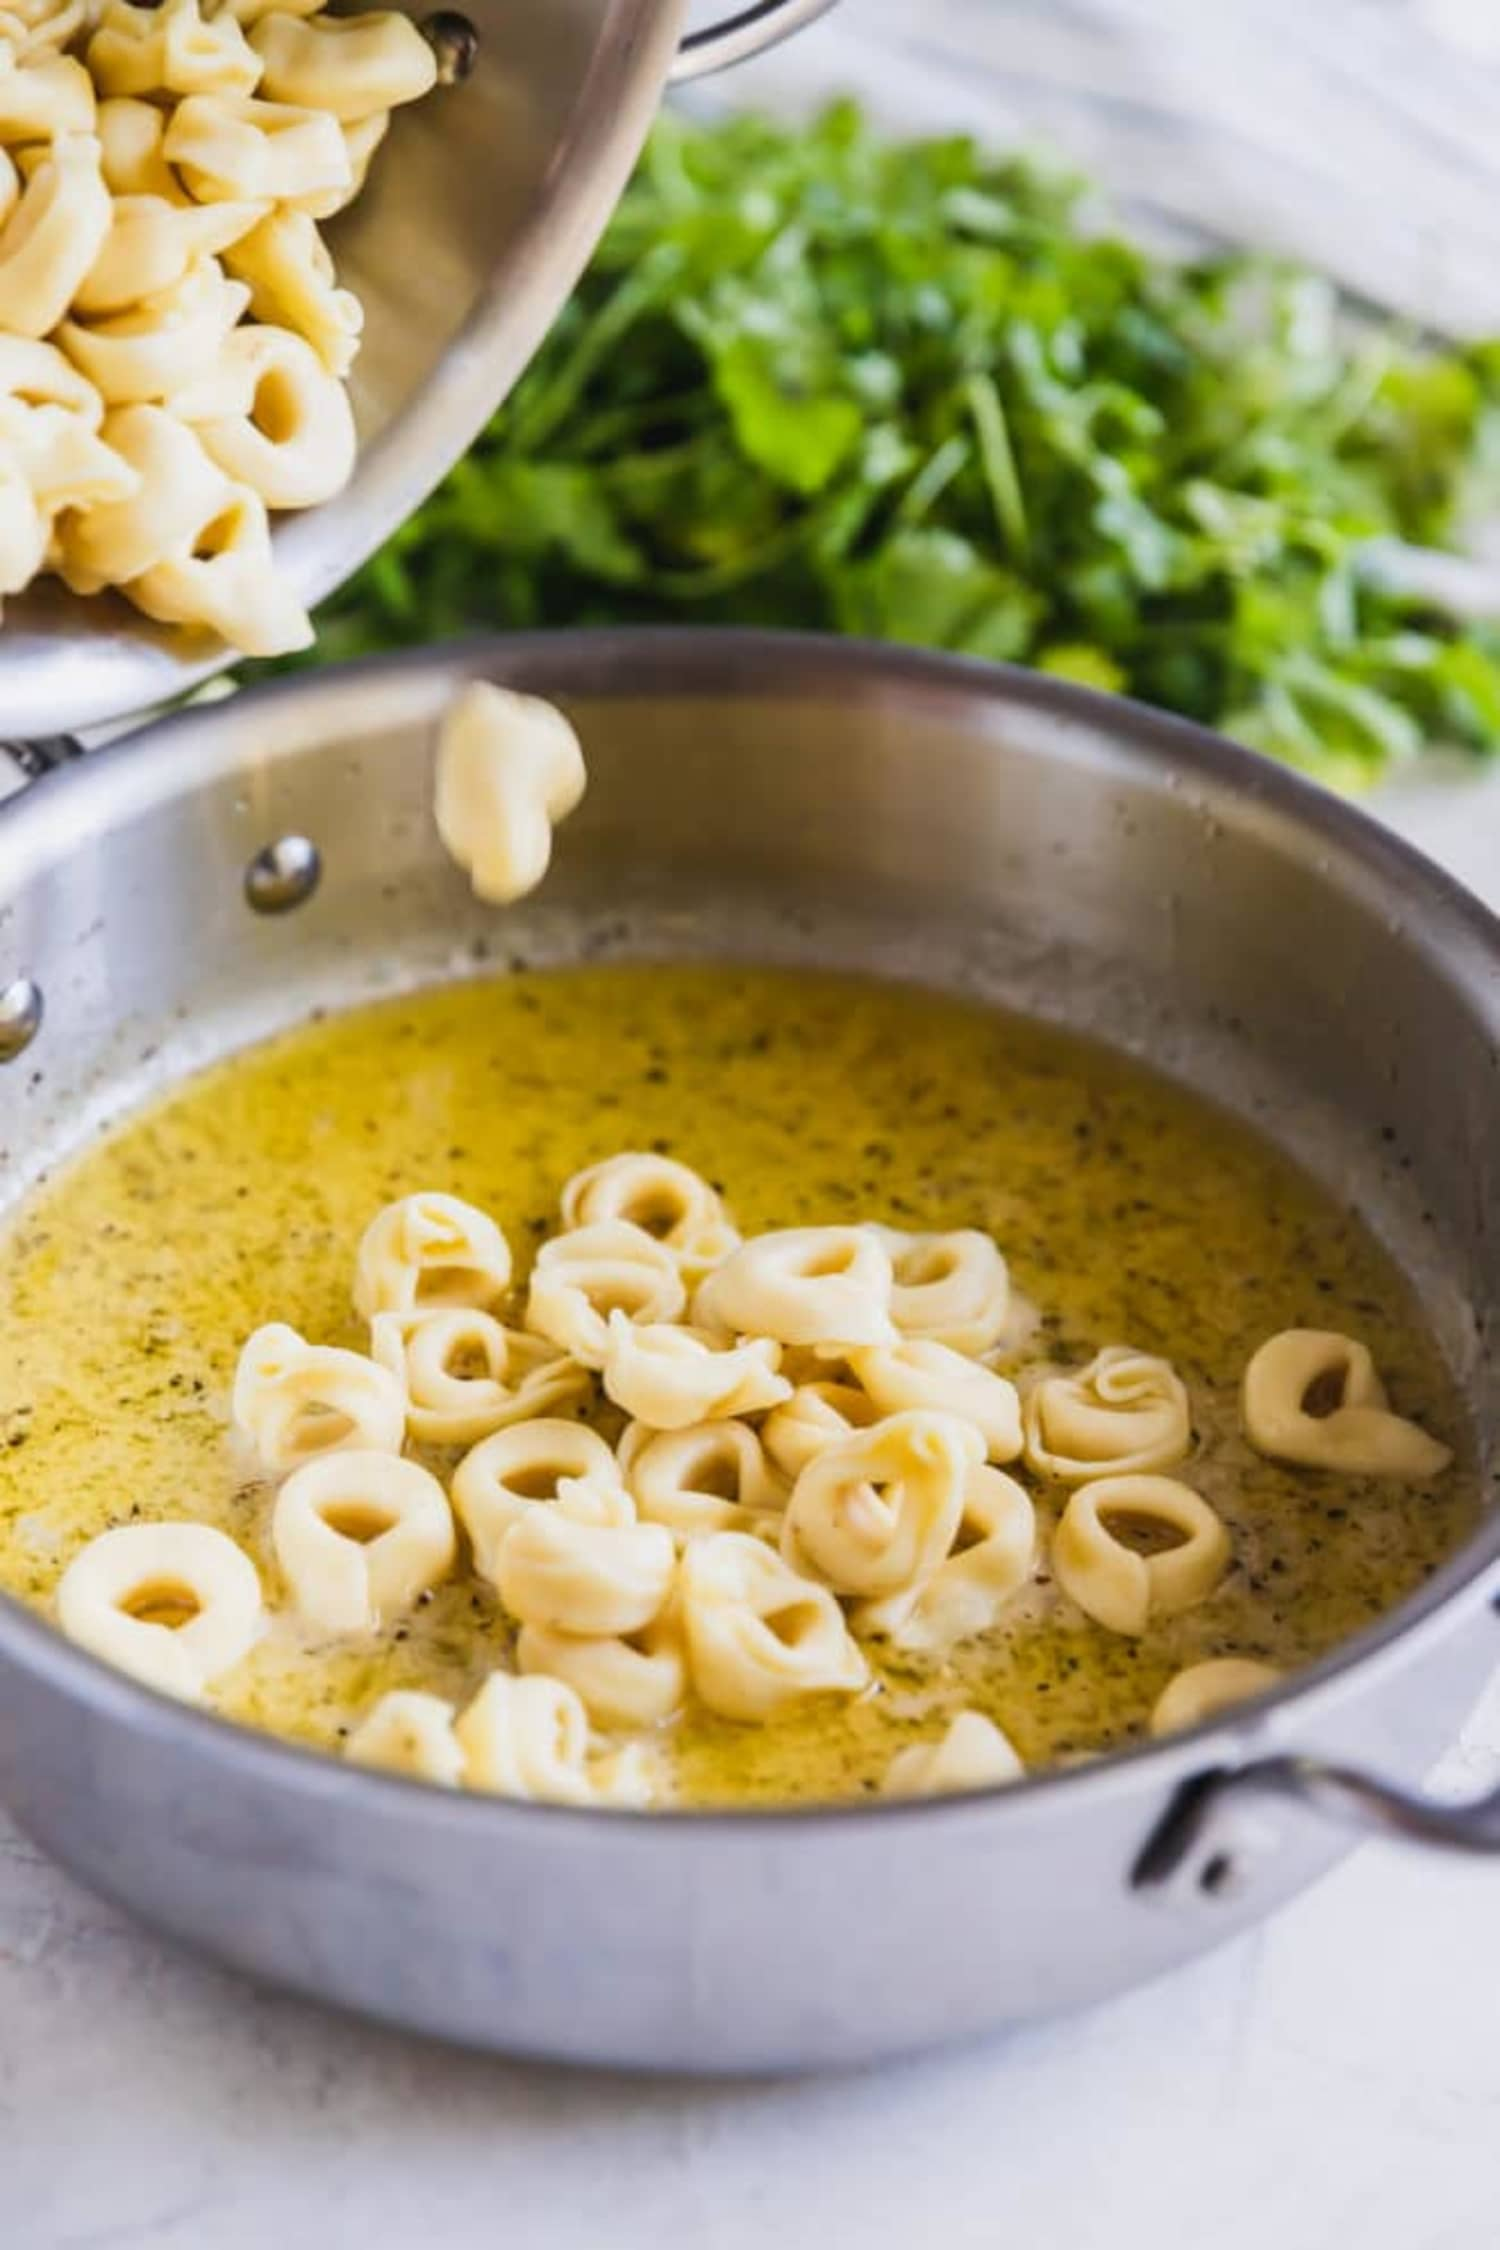 Cheese Tortellini in Garlic Sauce Is a Weeknight Hero